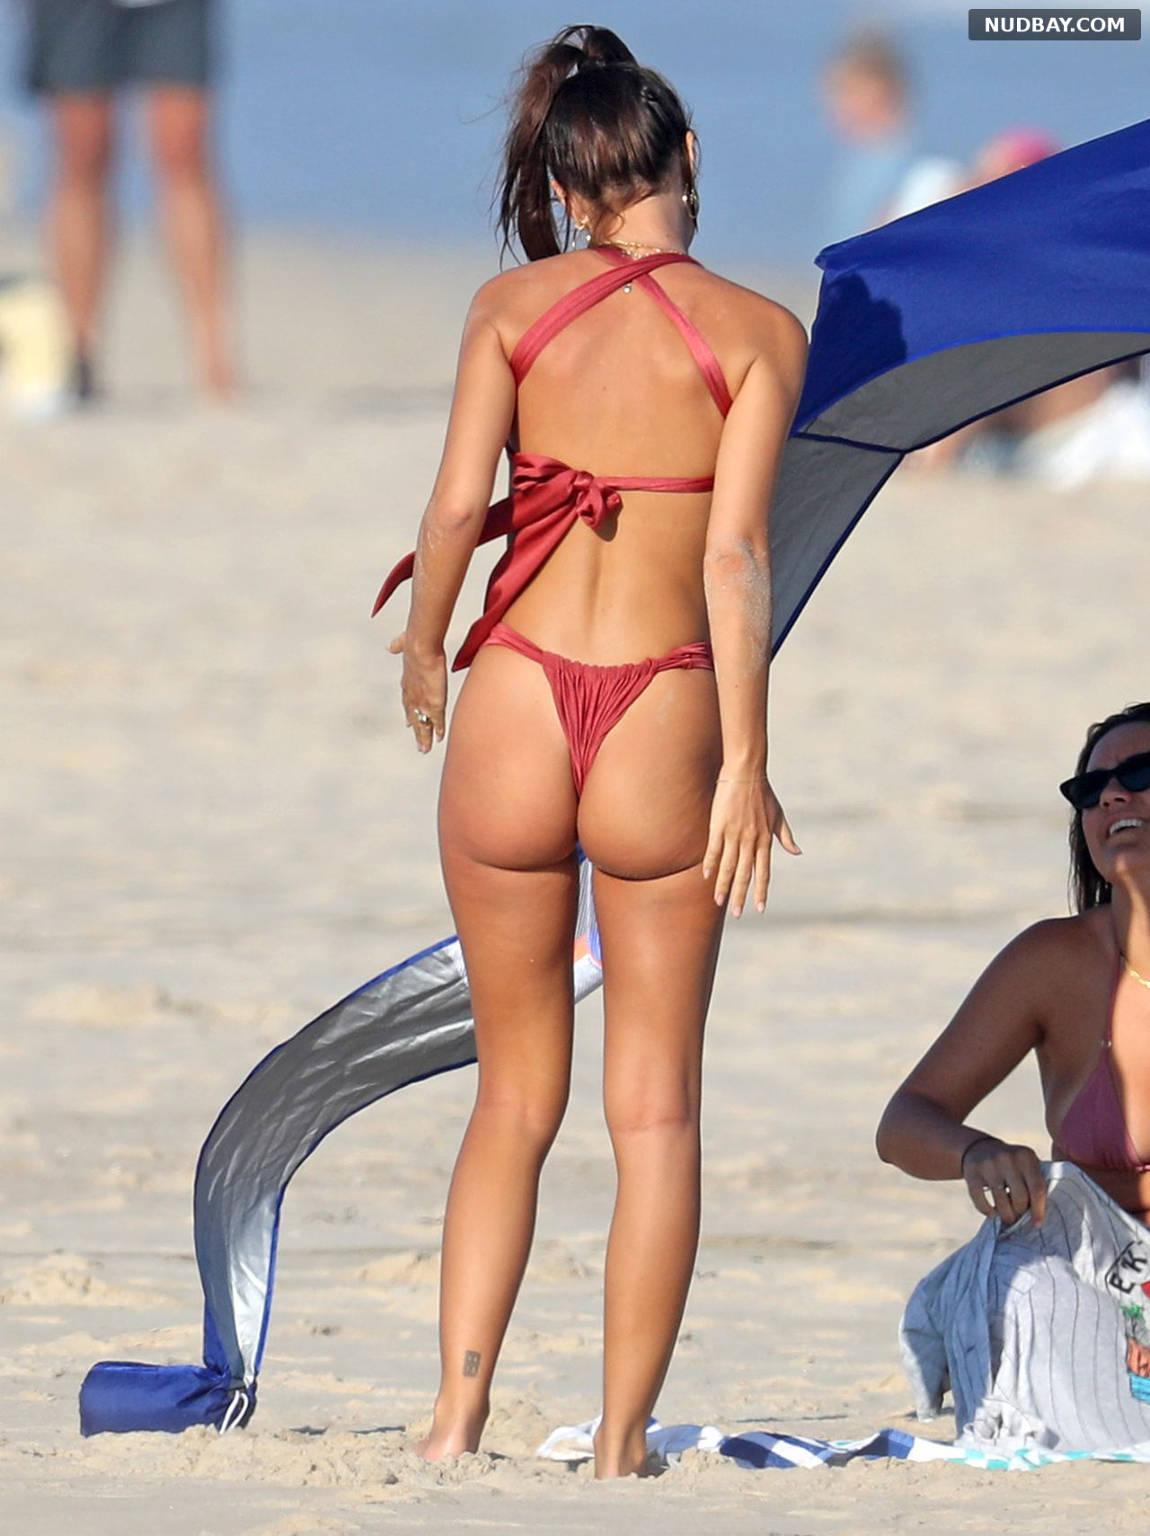 Emily Ratajkowski Ass on the beach in The Hamptons Aug 05 2020